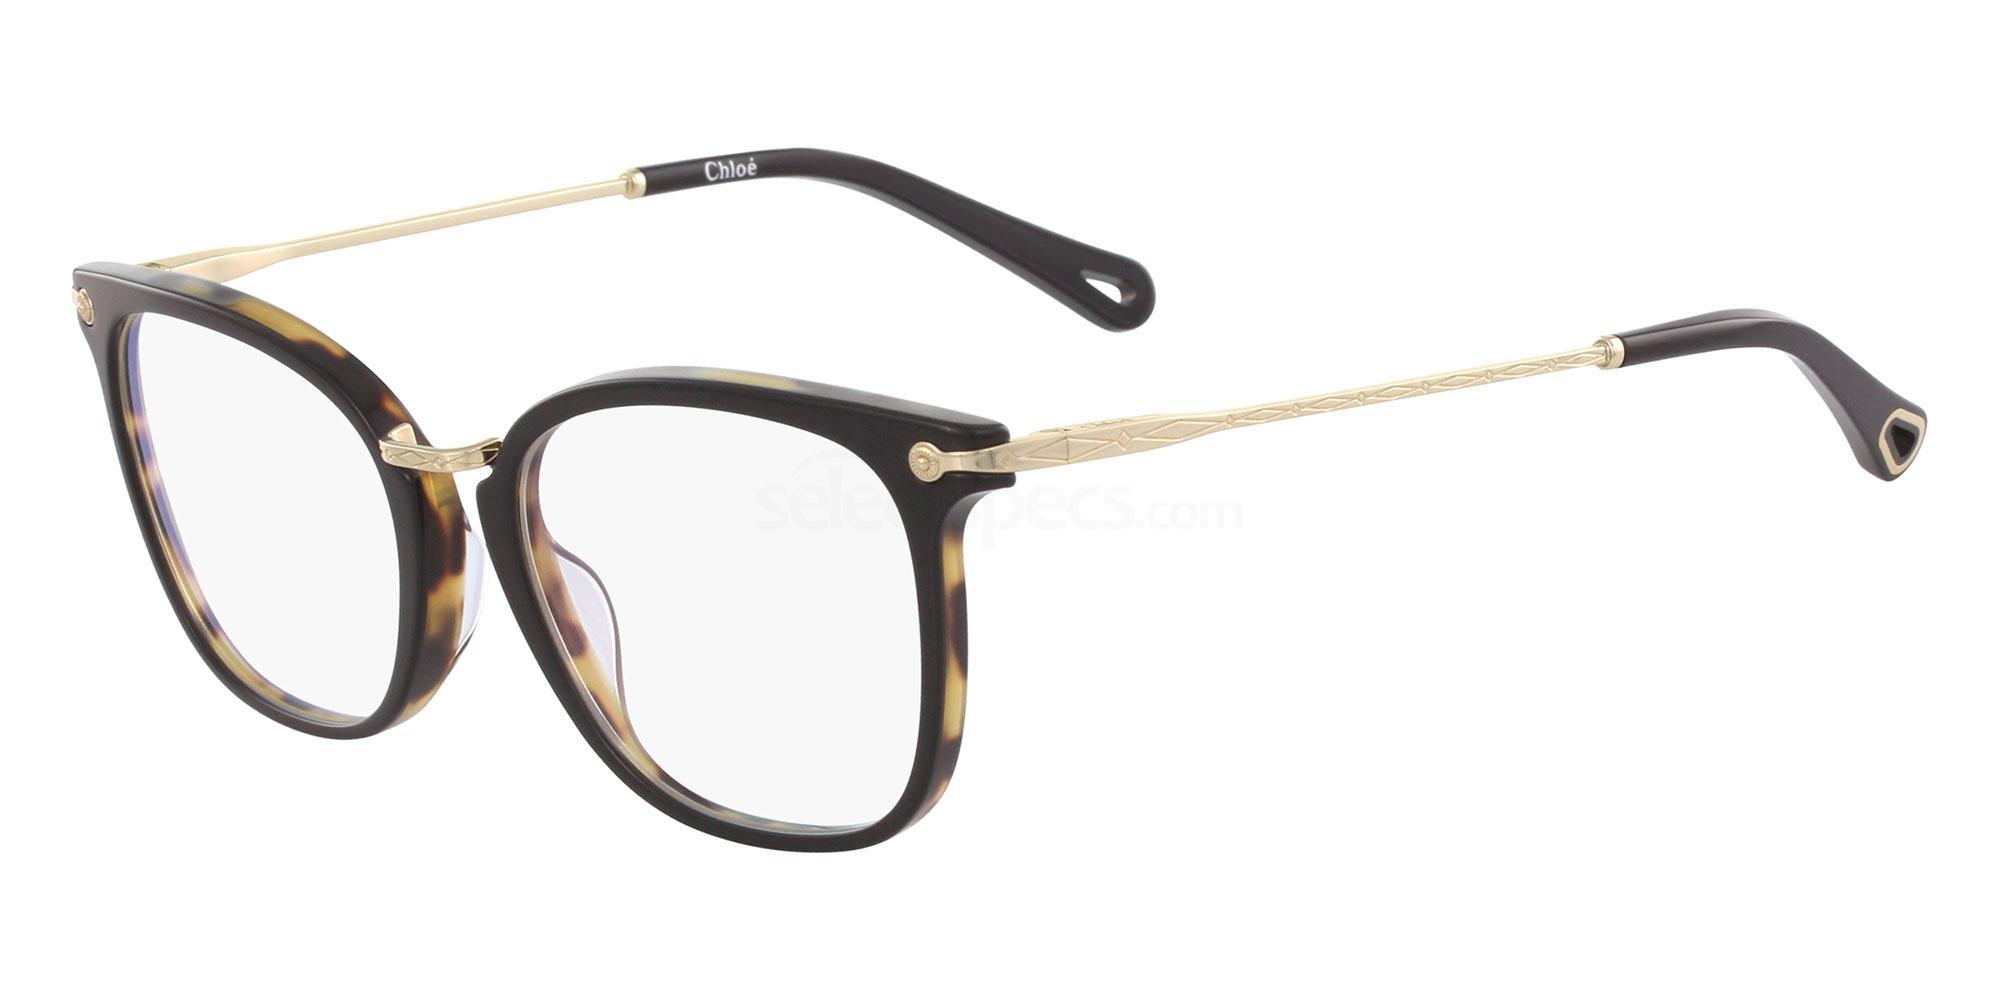 004 CE2734 Glasses, Chloe